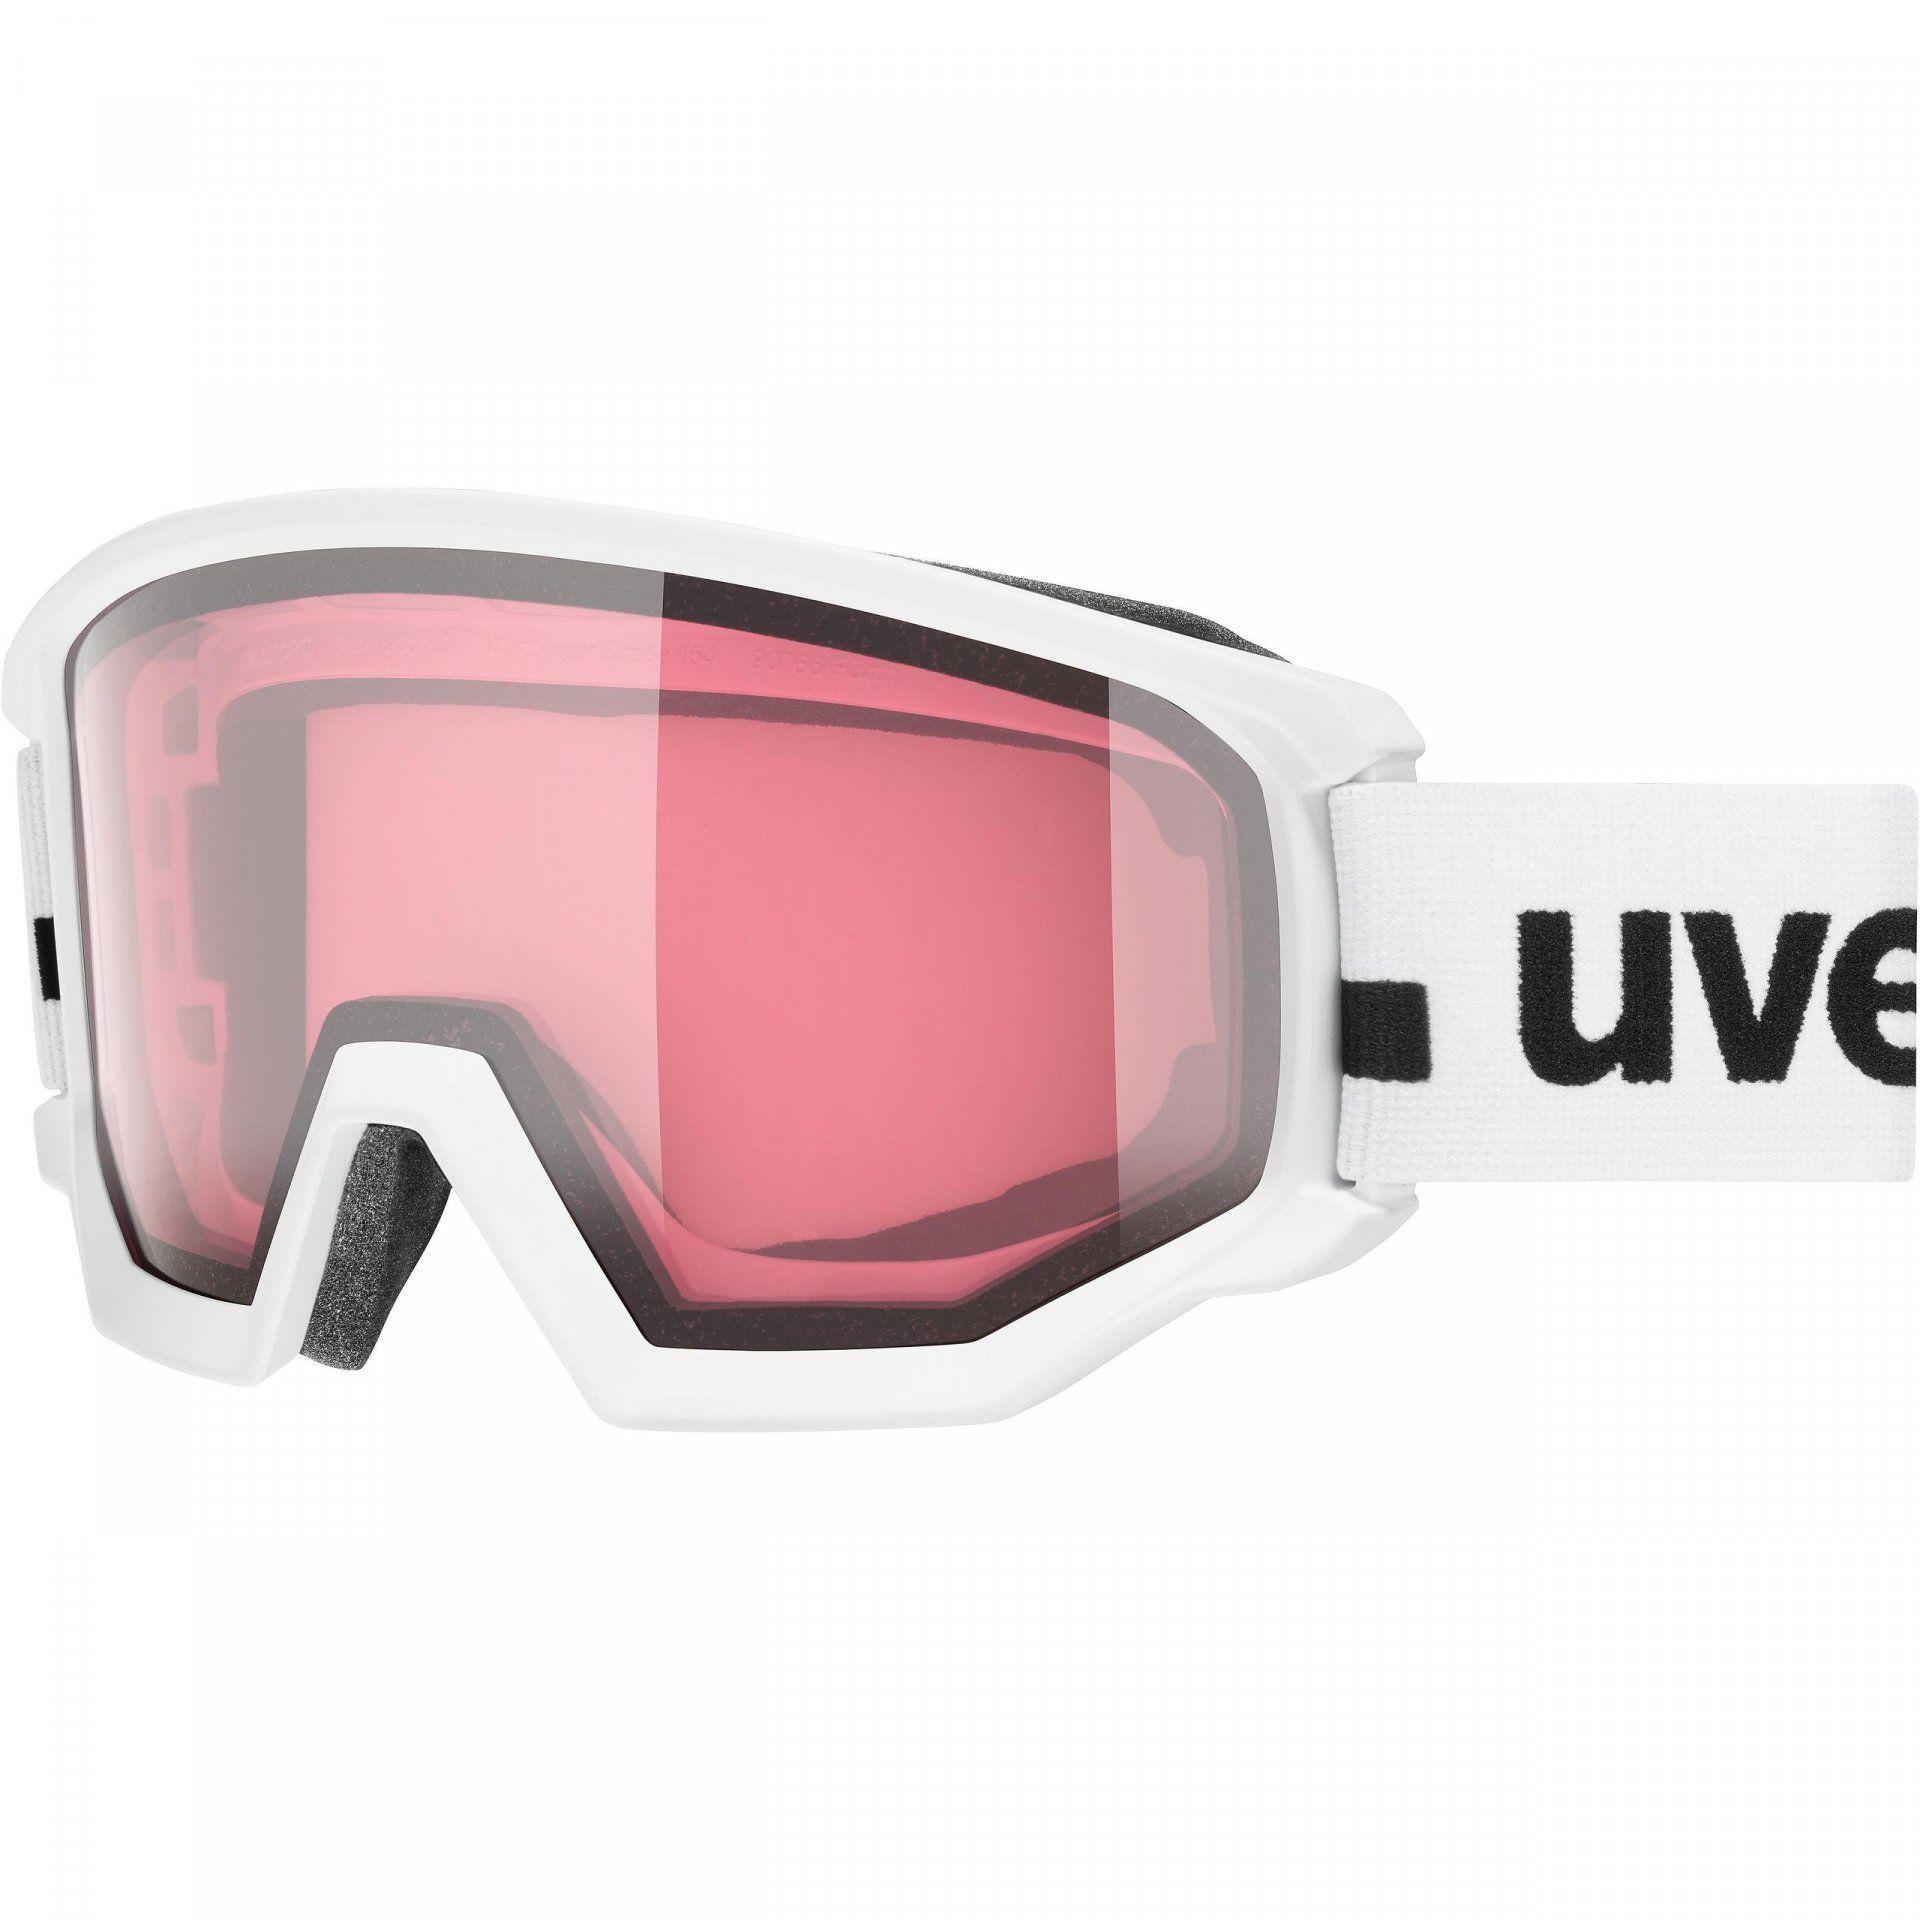 GOGLE UVEX ATHLETIC V  WHITE|VARIOMATIC PINK CLEAR 55|0|525|1030